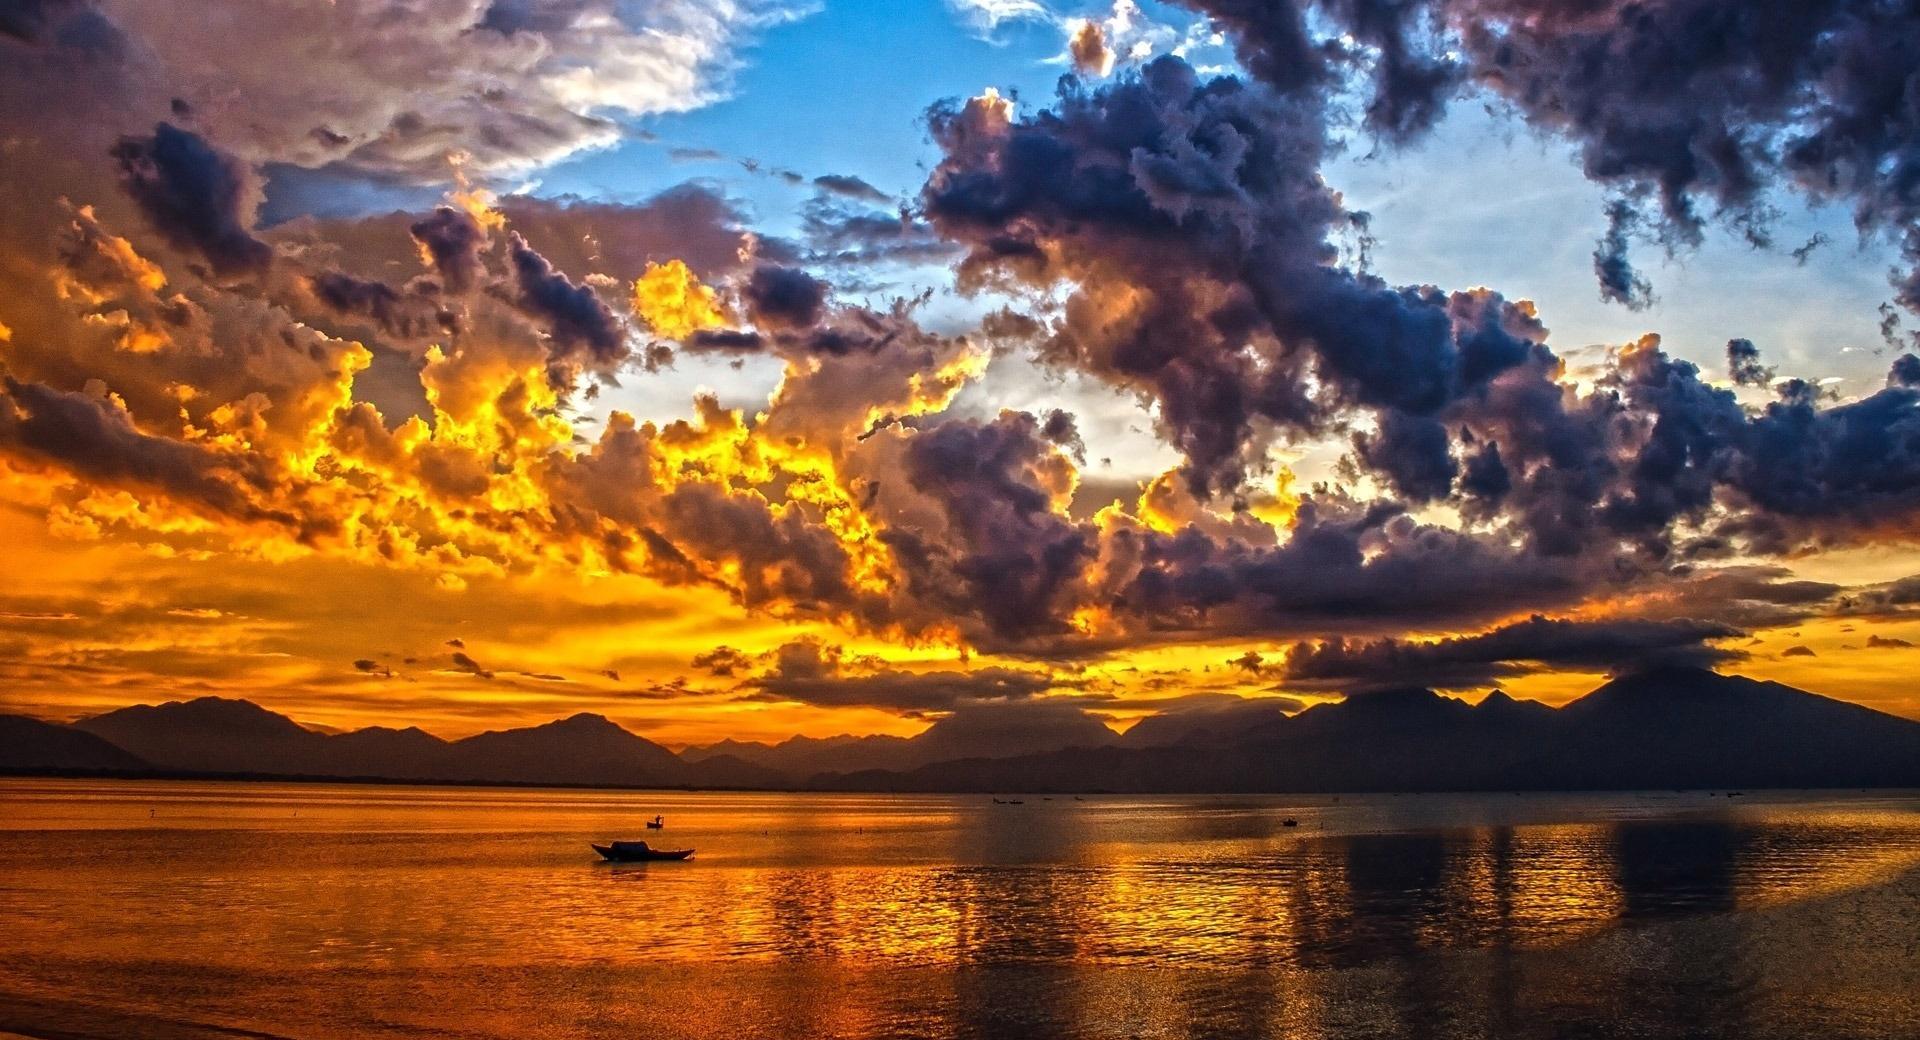 Vietnam Sunset wallpapers HD quality